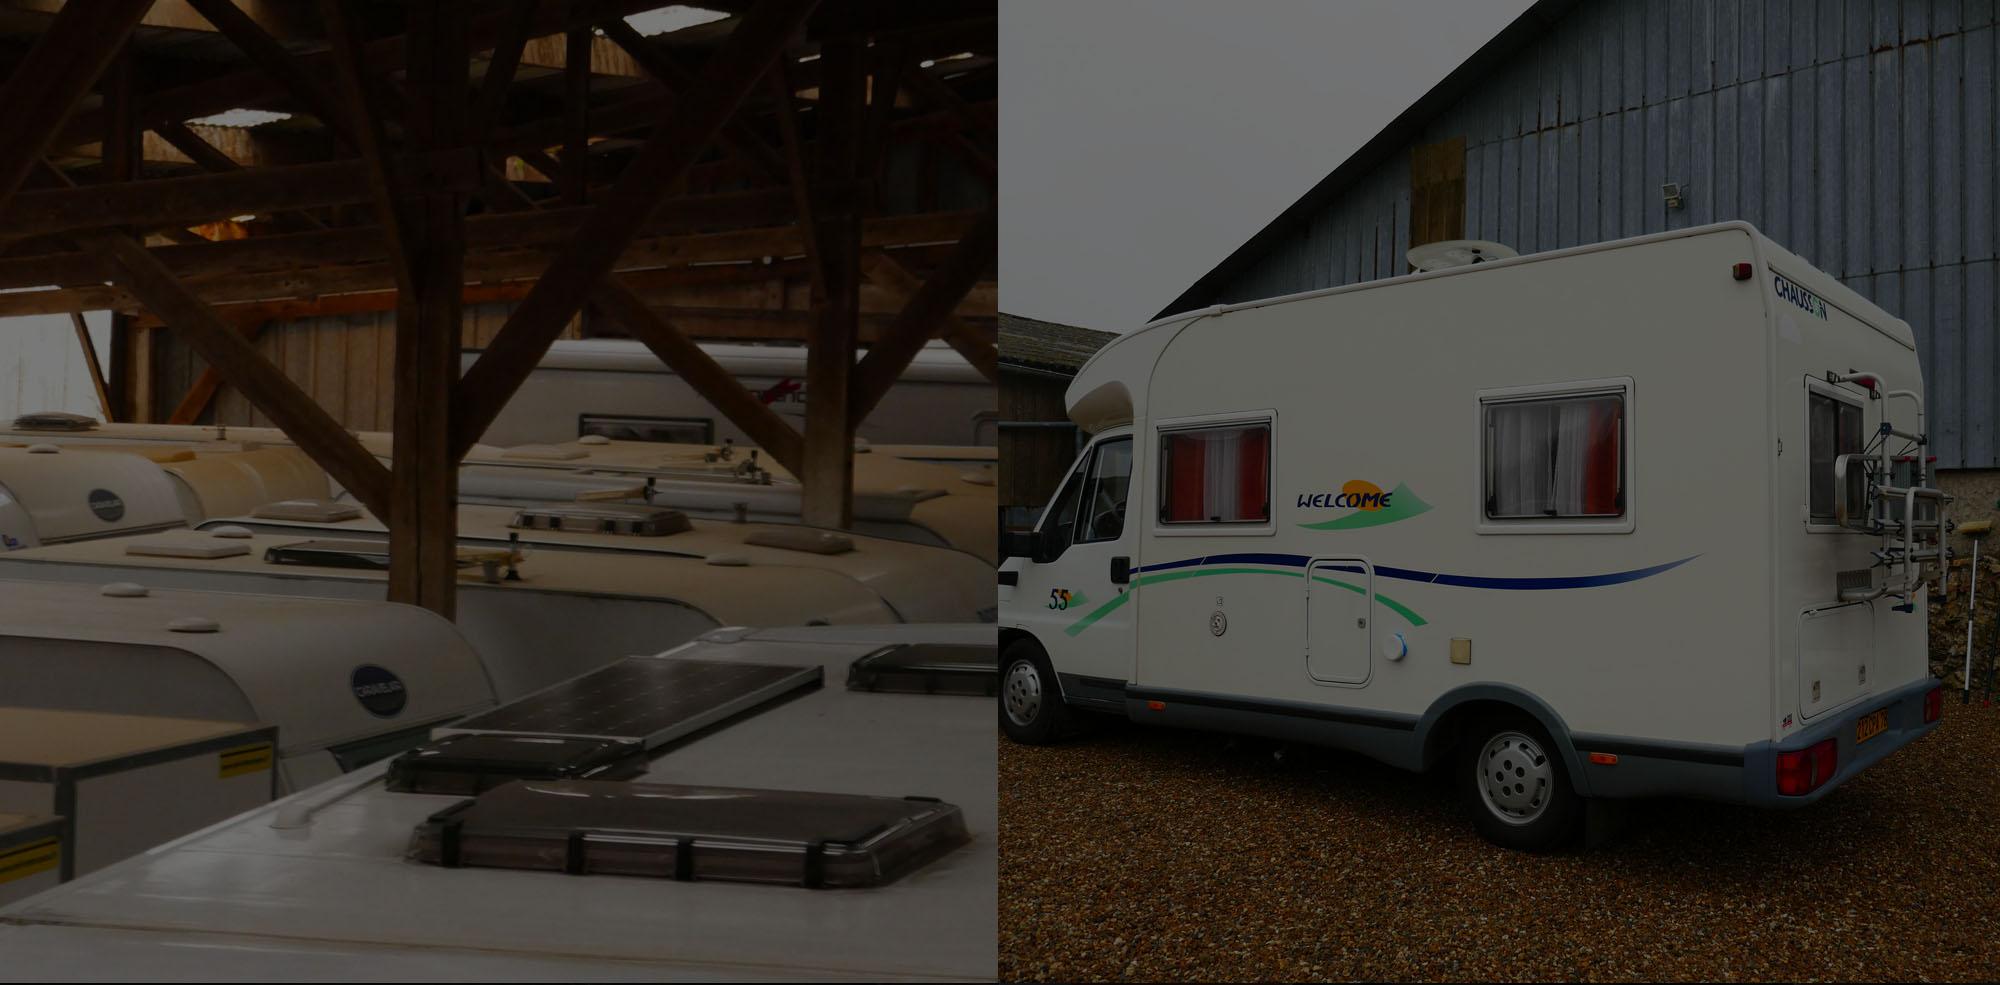 gardiennage caravane beauvais gardiennage camping car chantilly gardiennage bateau oise 60 h3c. Black Bedroom Furniture Sets. Home Design Ideas